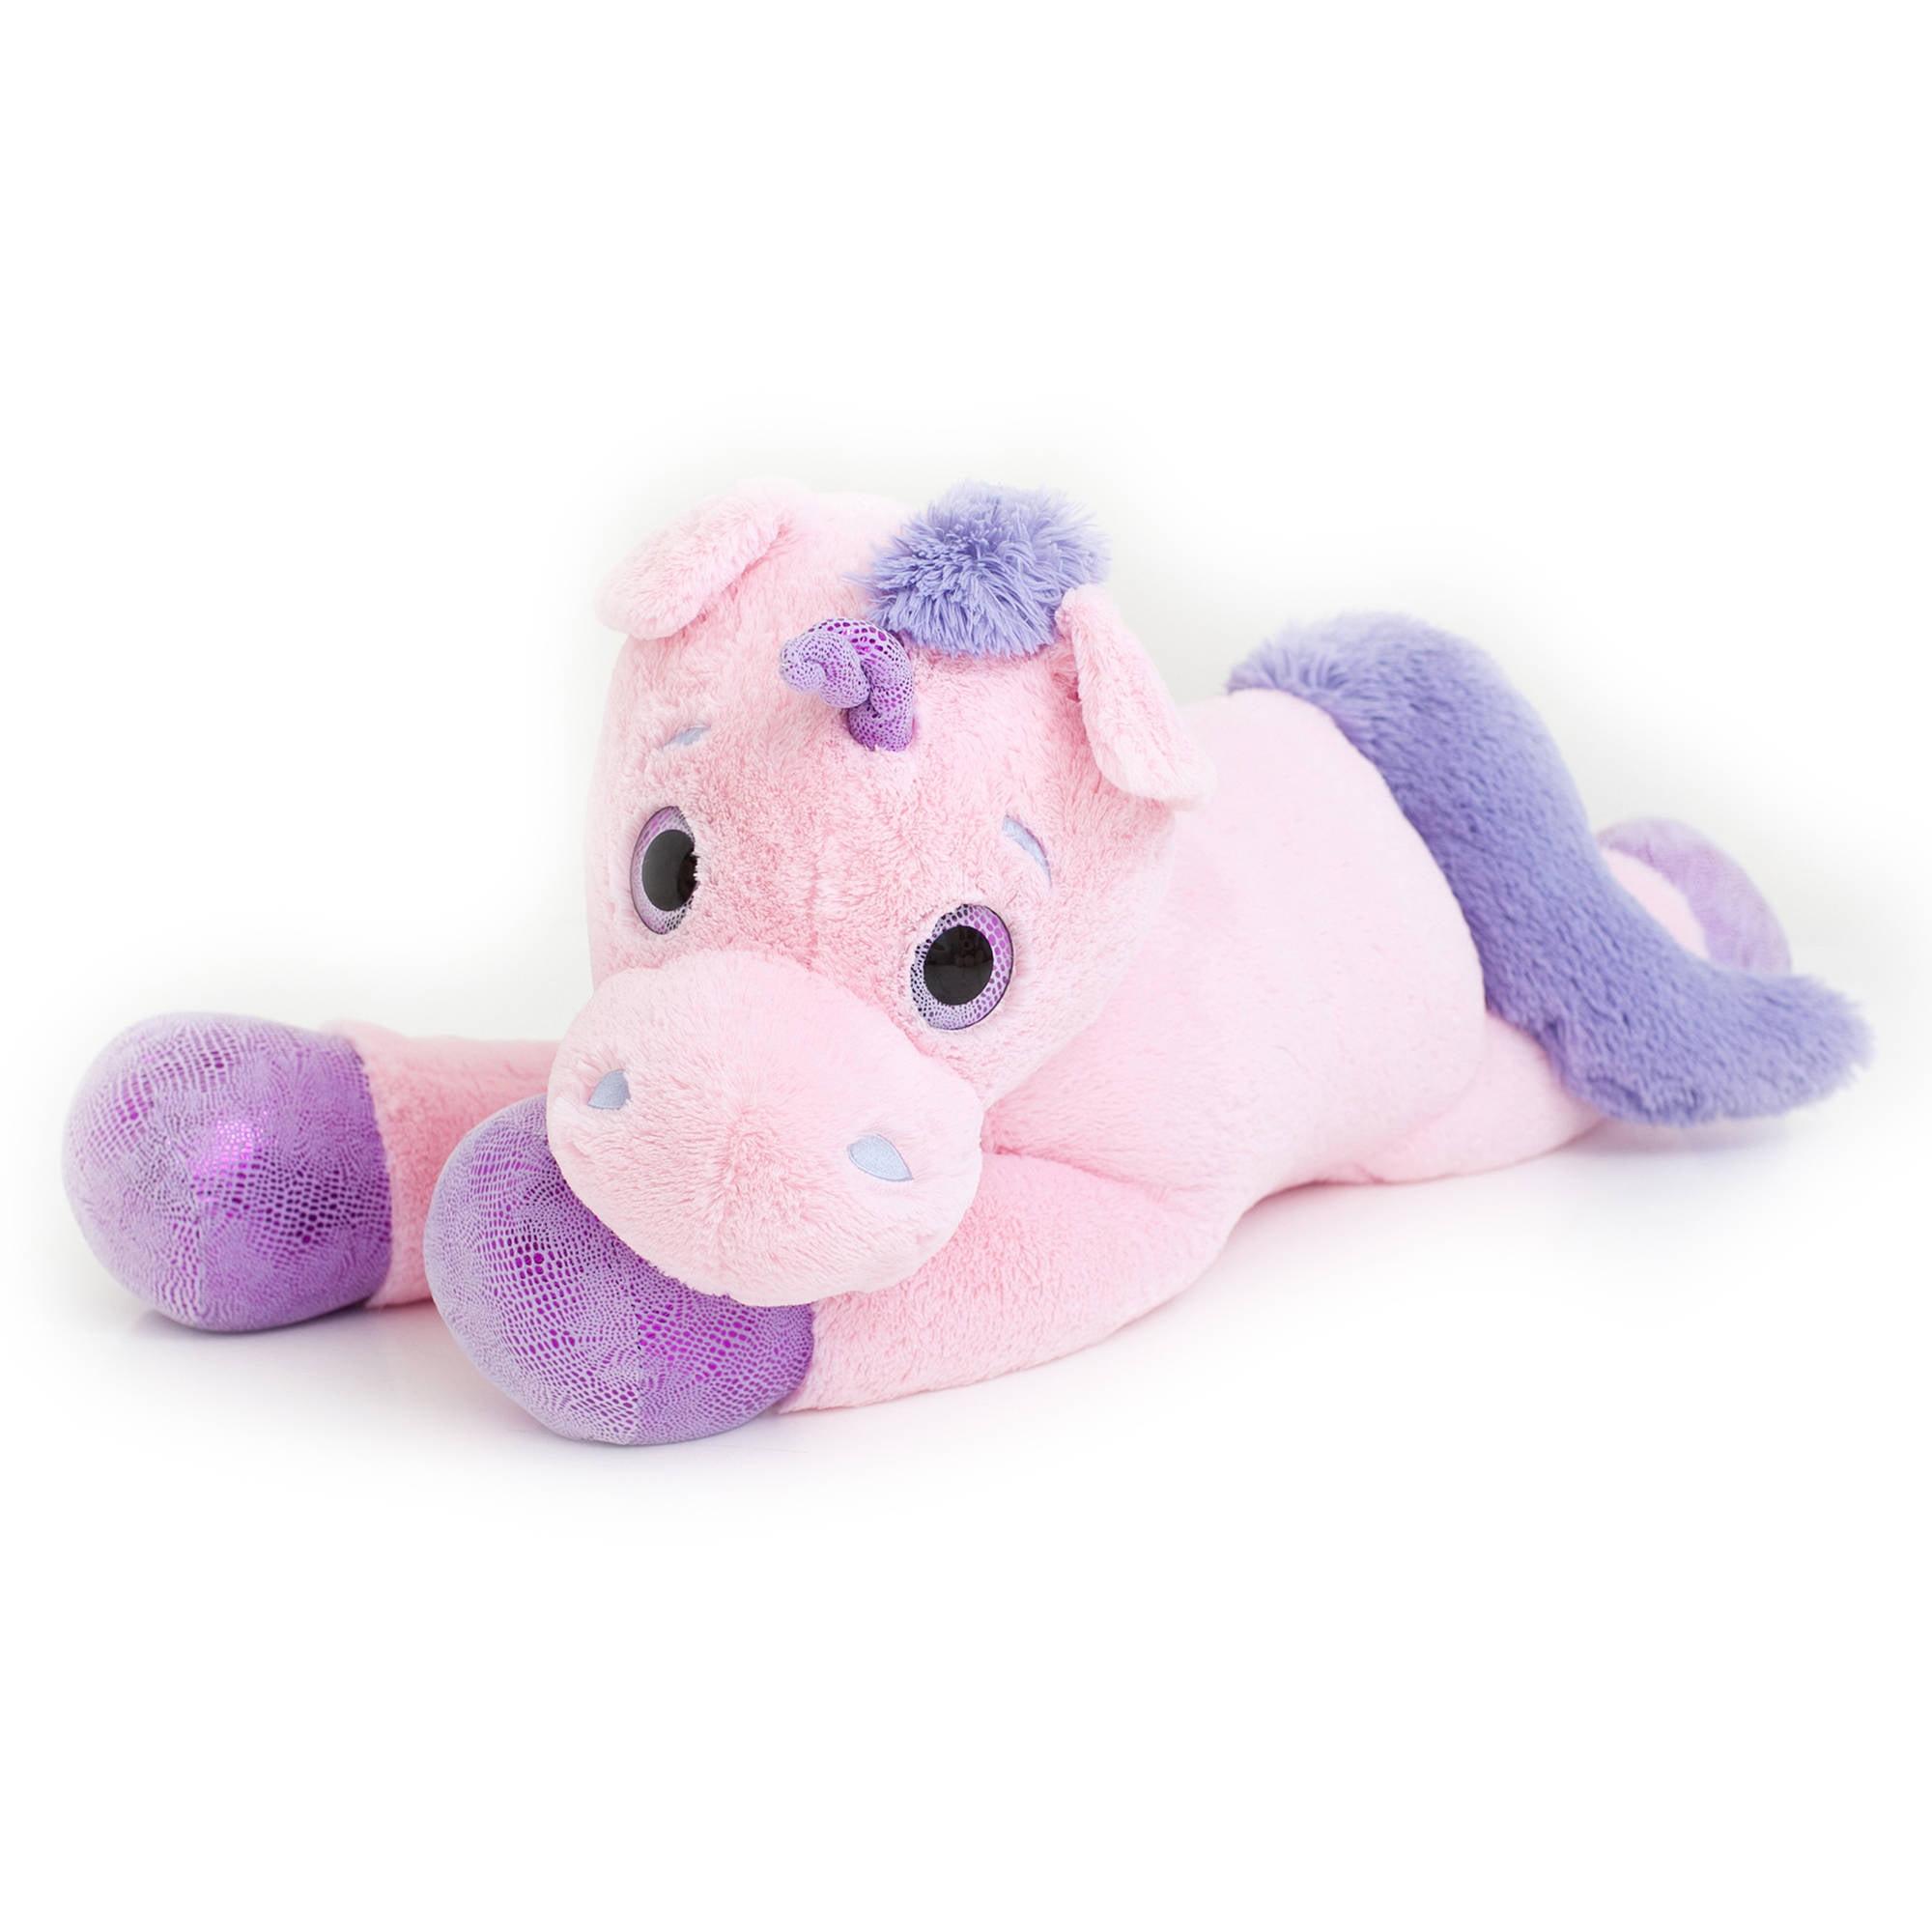 Best Made Toys Jumbo Plush Unicorn - Walmart.com de725145a